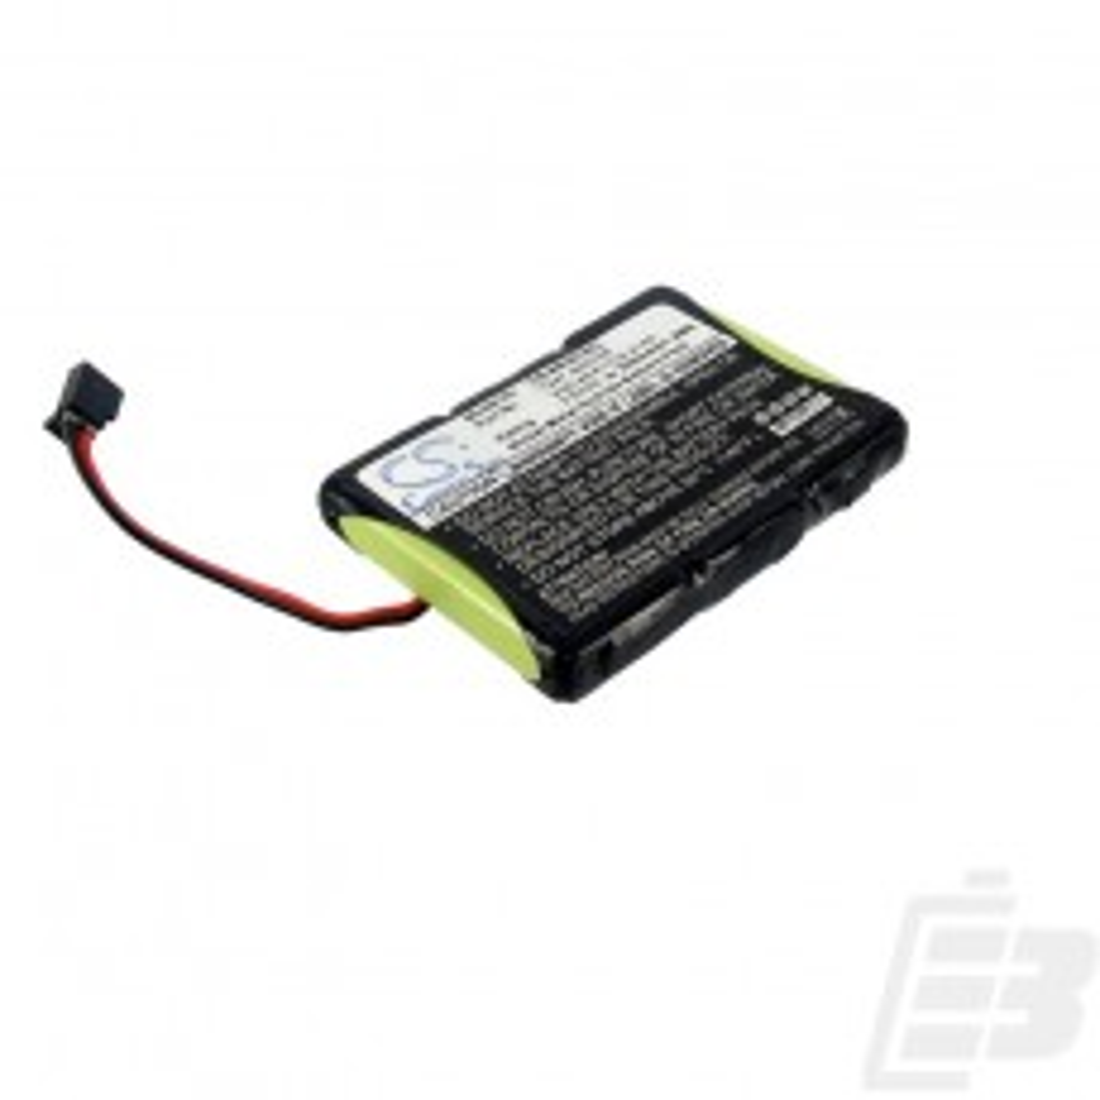 Cordless phone battery Siemens Gigaset 3000 Micro_1